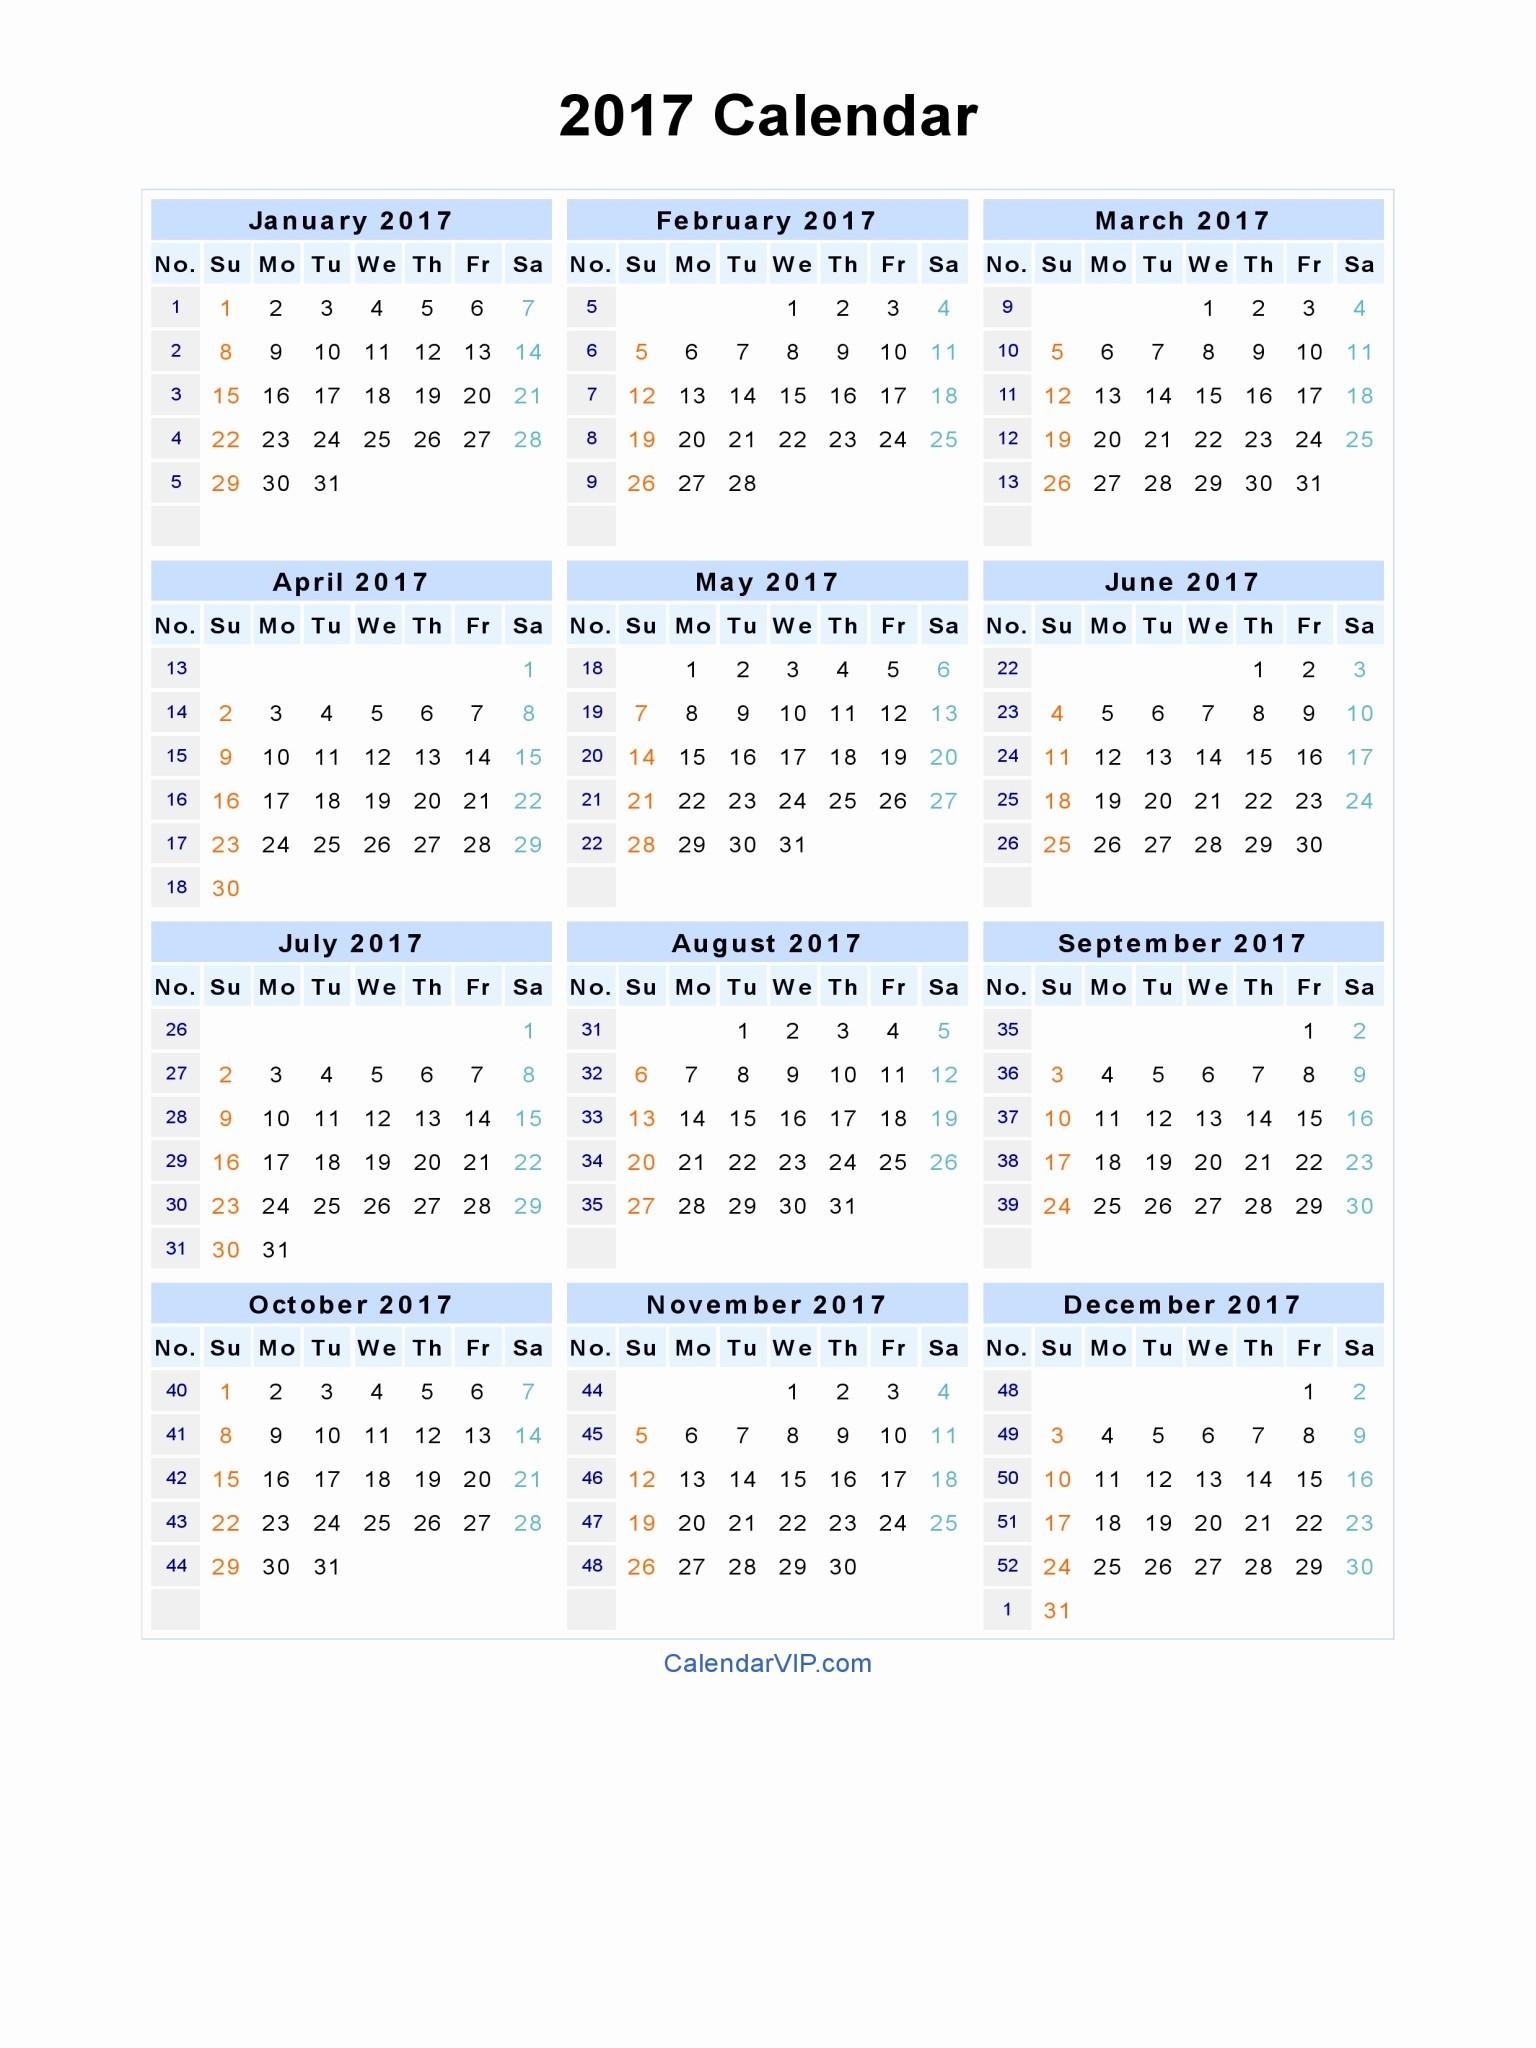 Full Year Calendar 2017 Printable Inspirational 2017 Calendar Blank Printable Calendar Template In Pdf